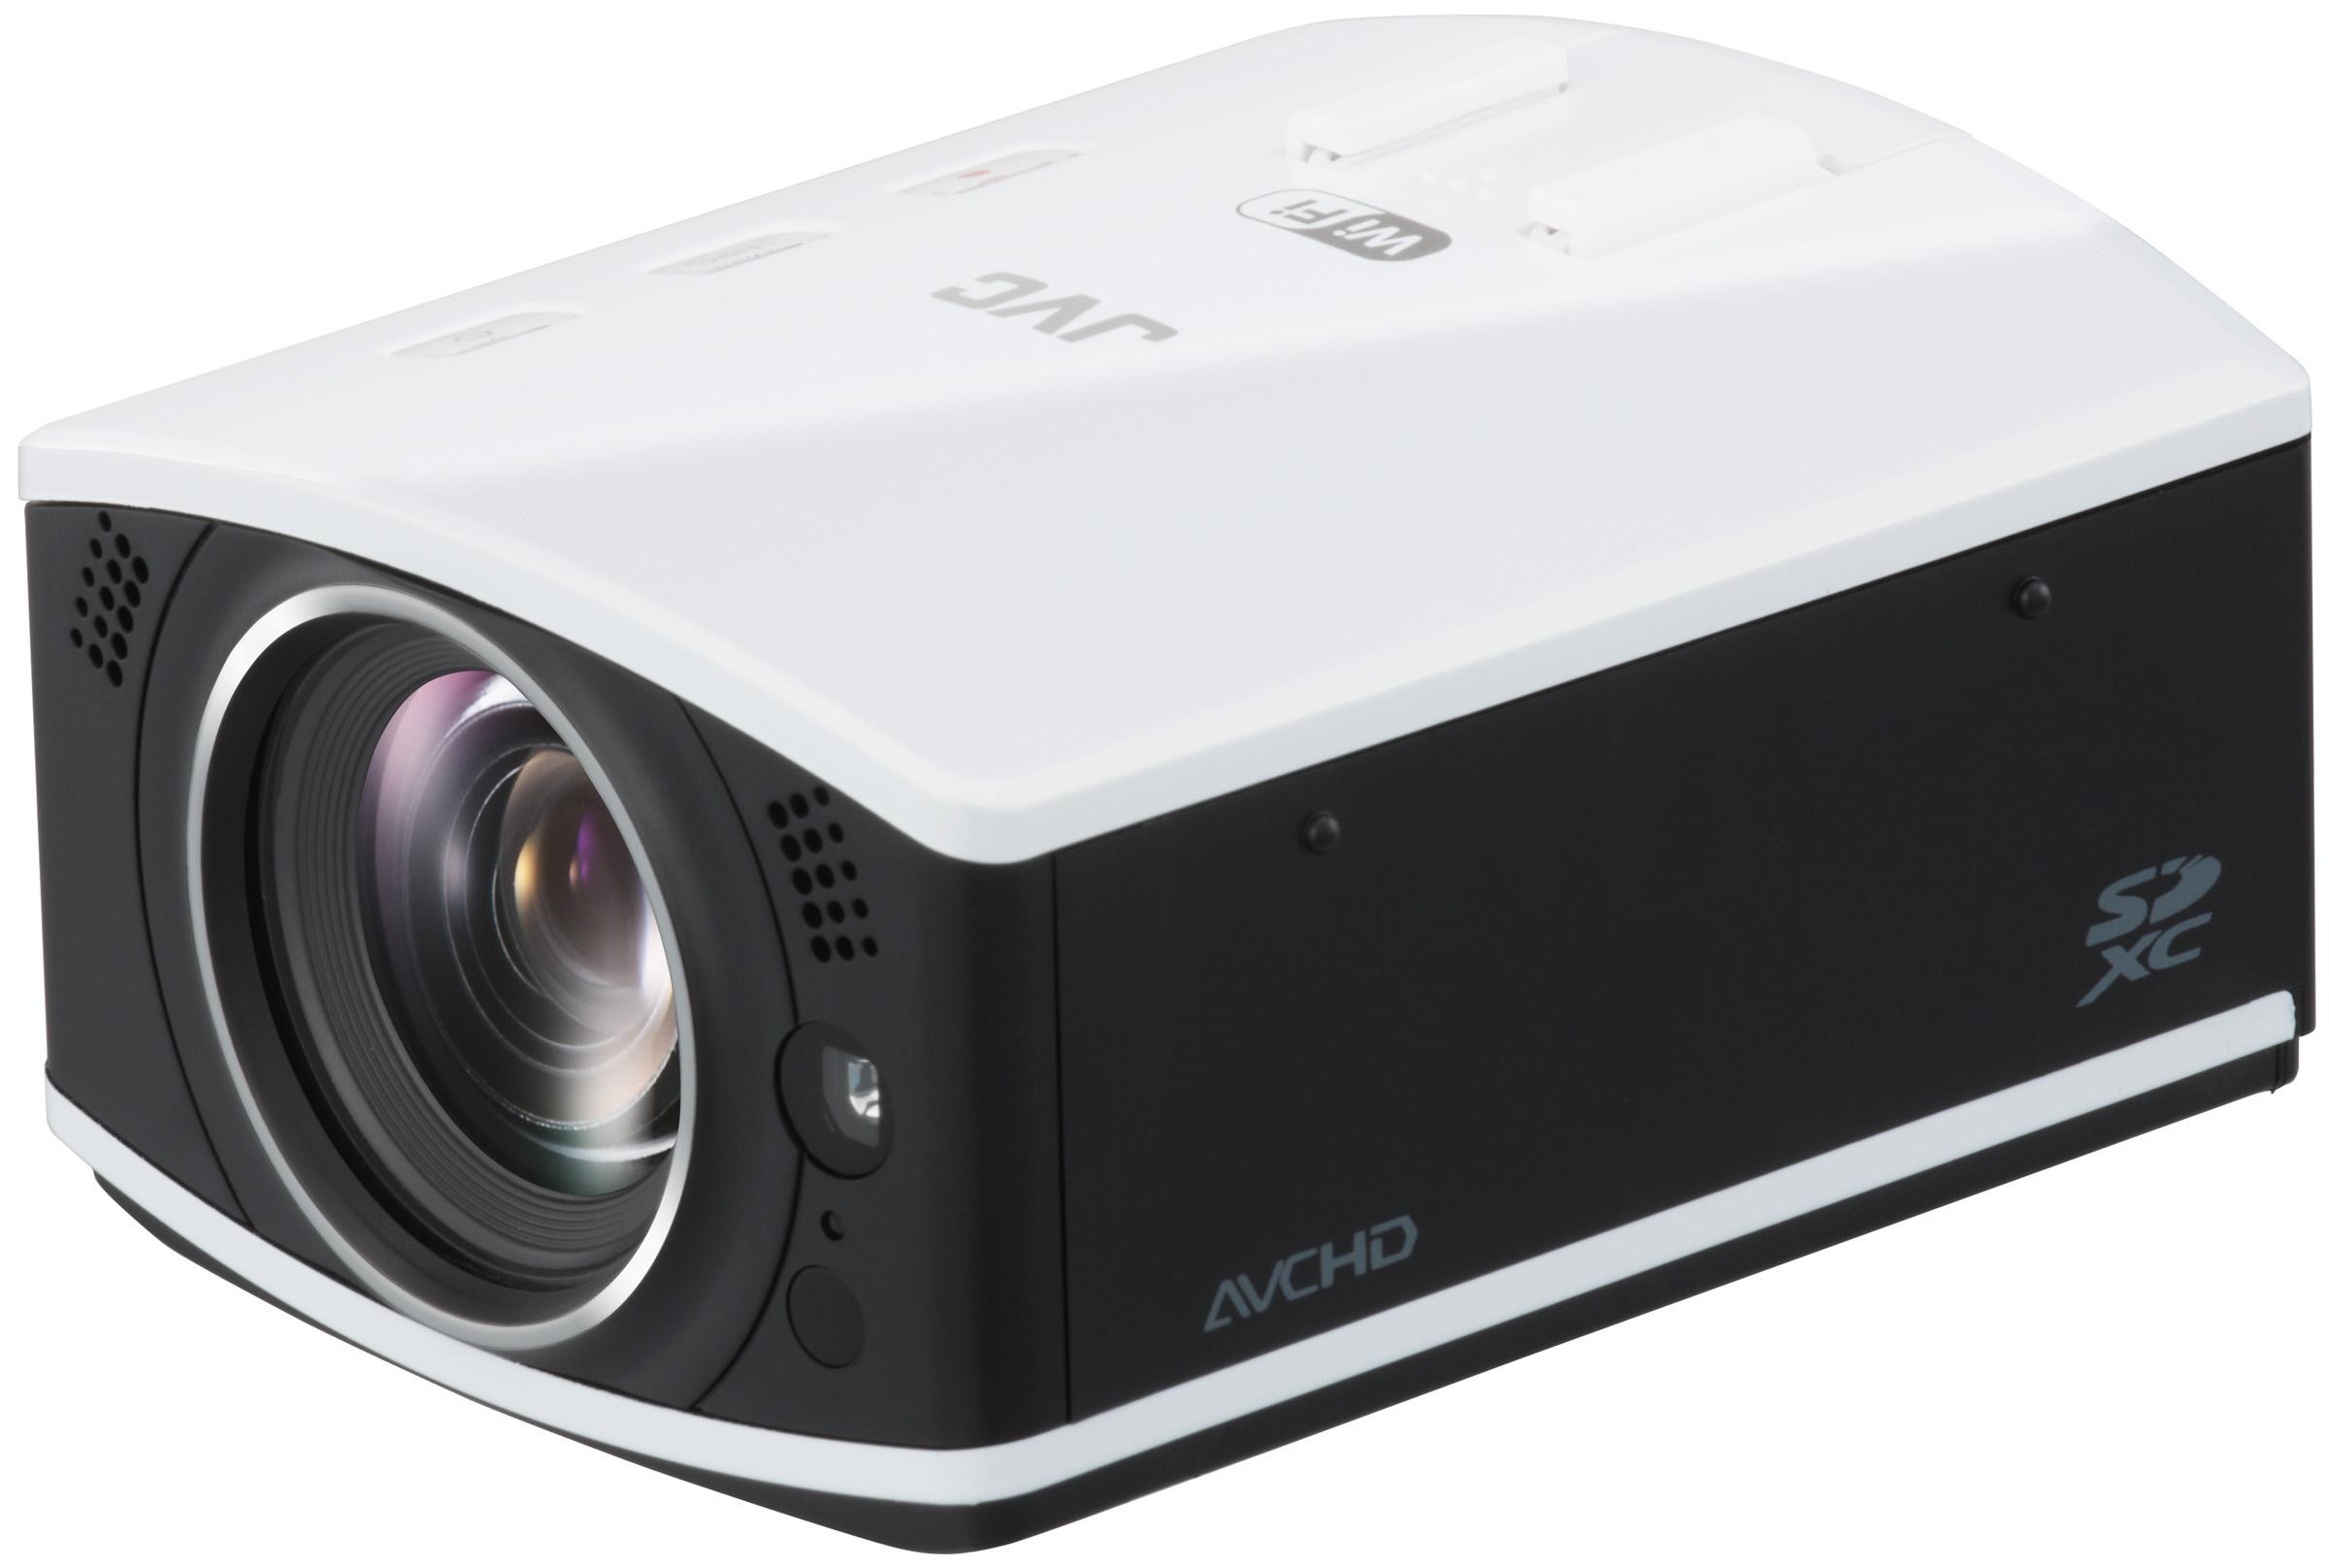 Gvls2 for Camera streaming live